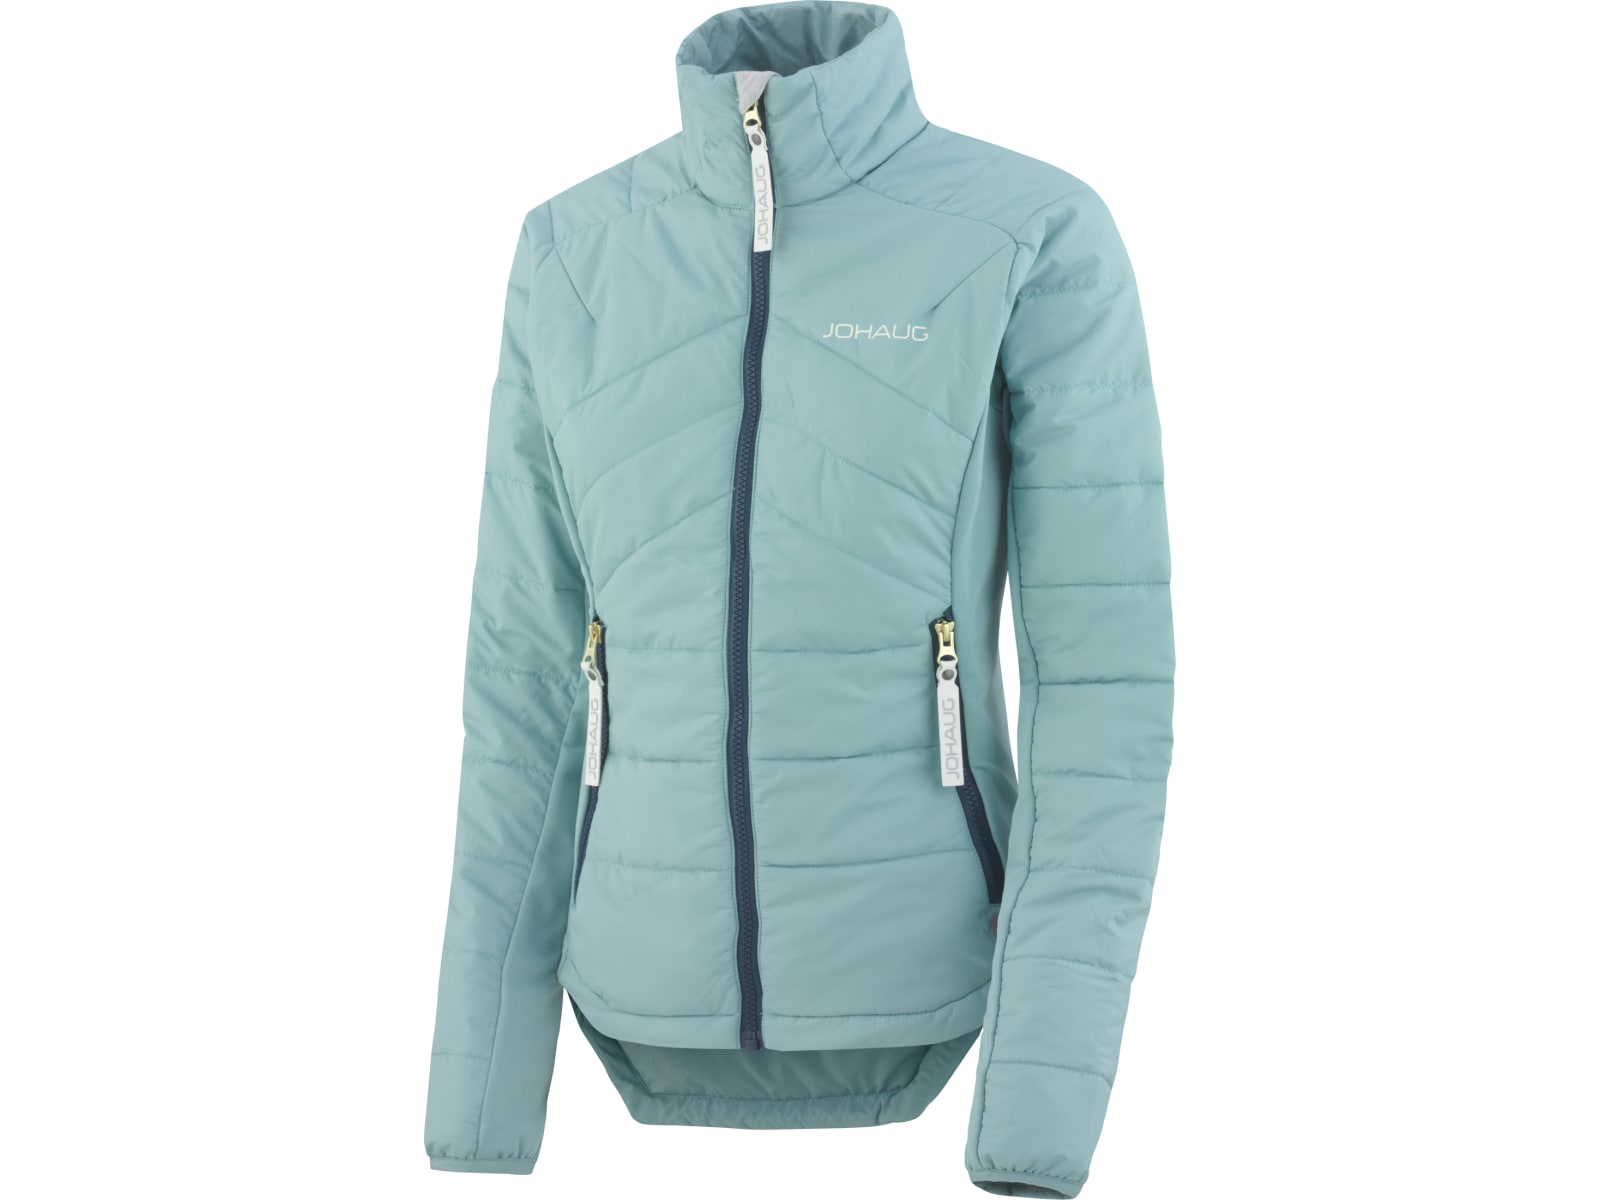 6bed49be Johaug Lofty Primaloft Jacket | Anton Sport